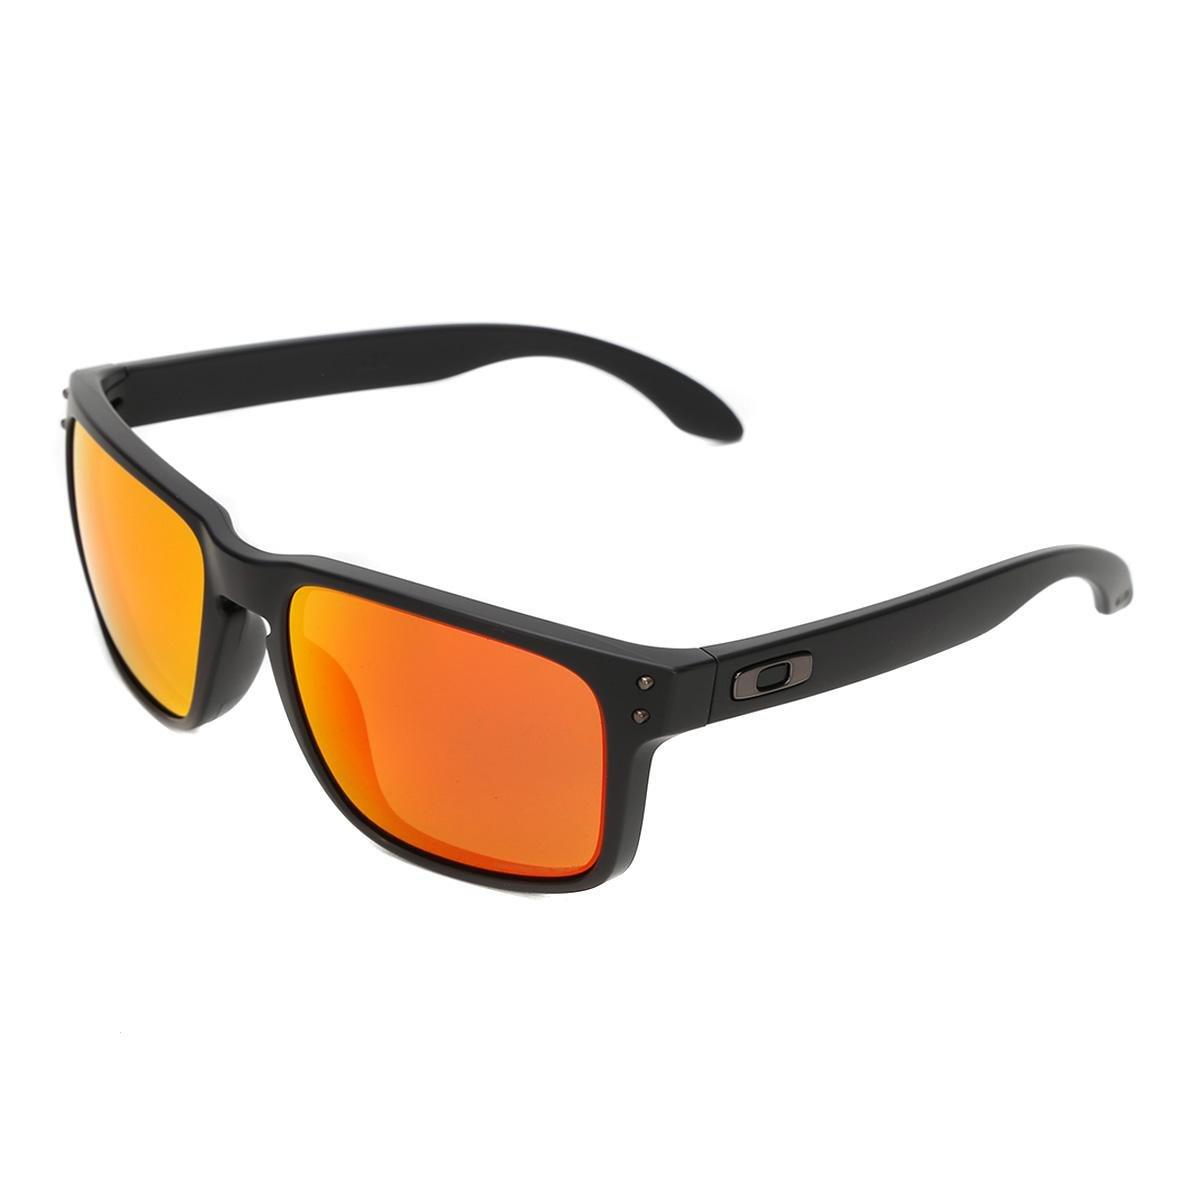 Óculos Oakley Holbrook - Preto e Laranja - Compre Agora   Zattini 680b55520e